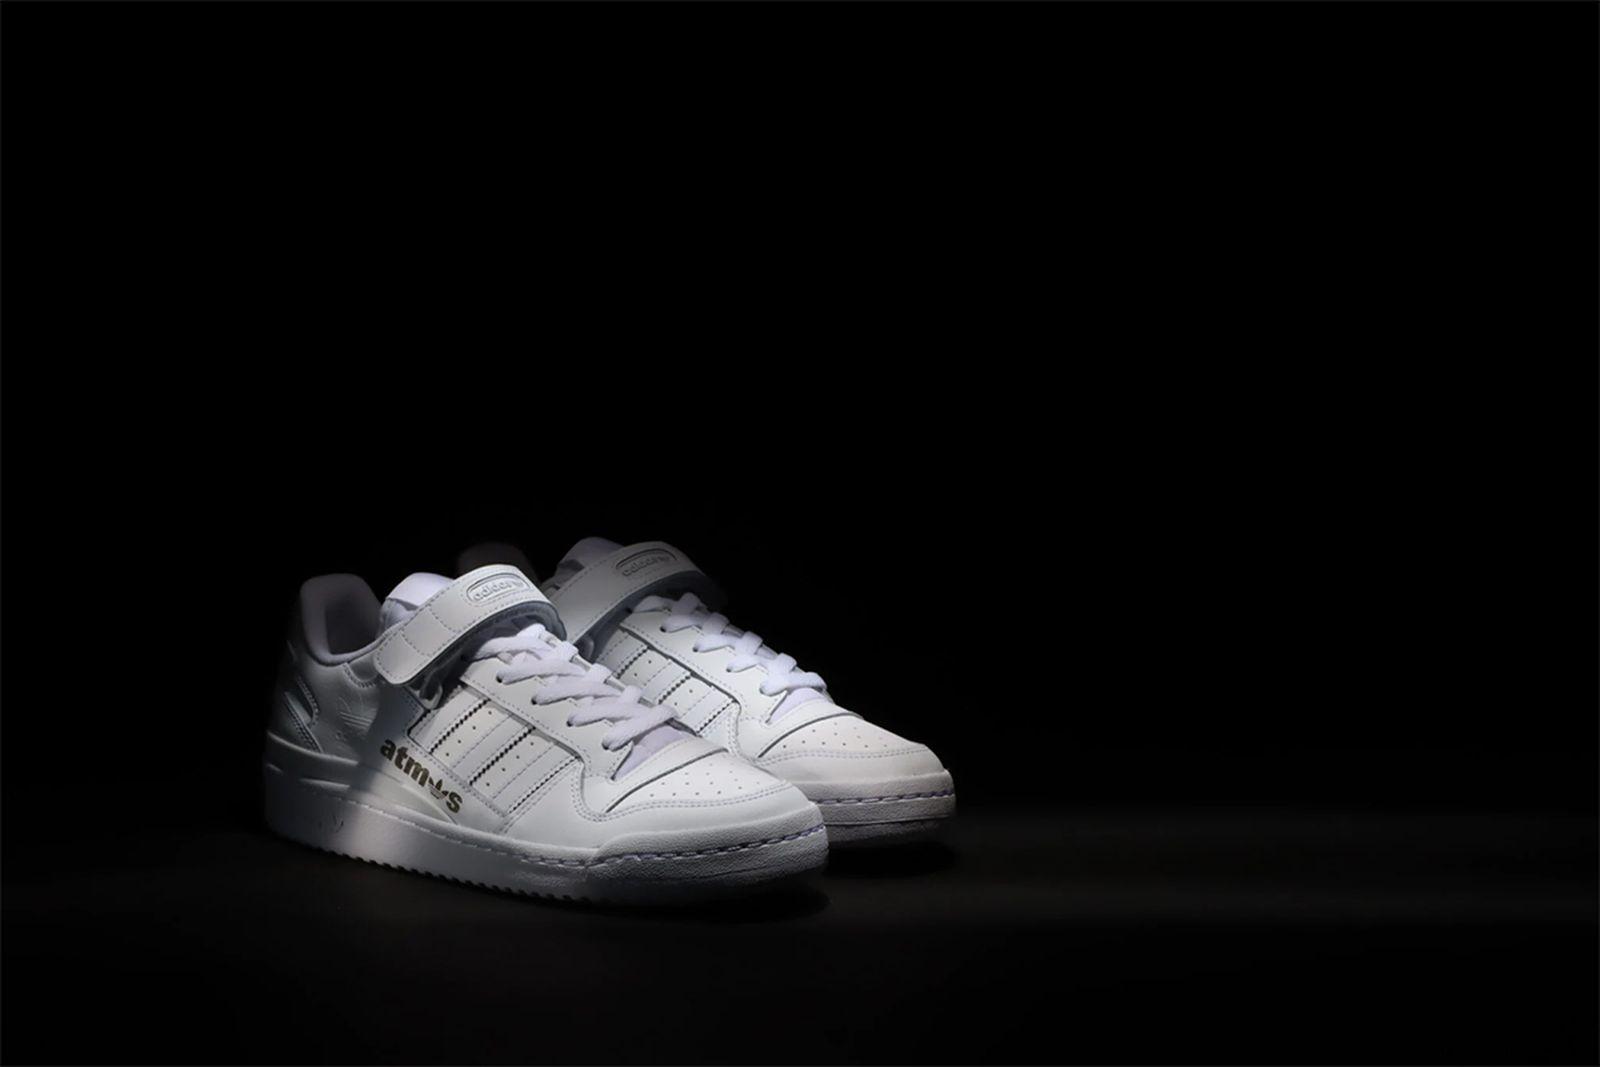 atmos-adidas-forum-low-release-info-01